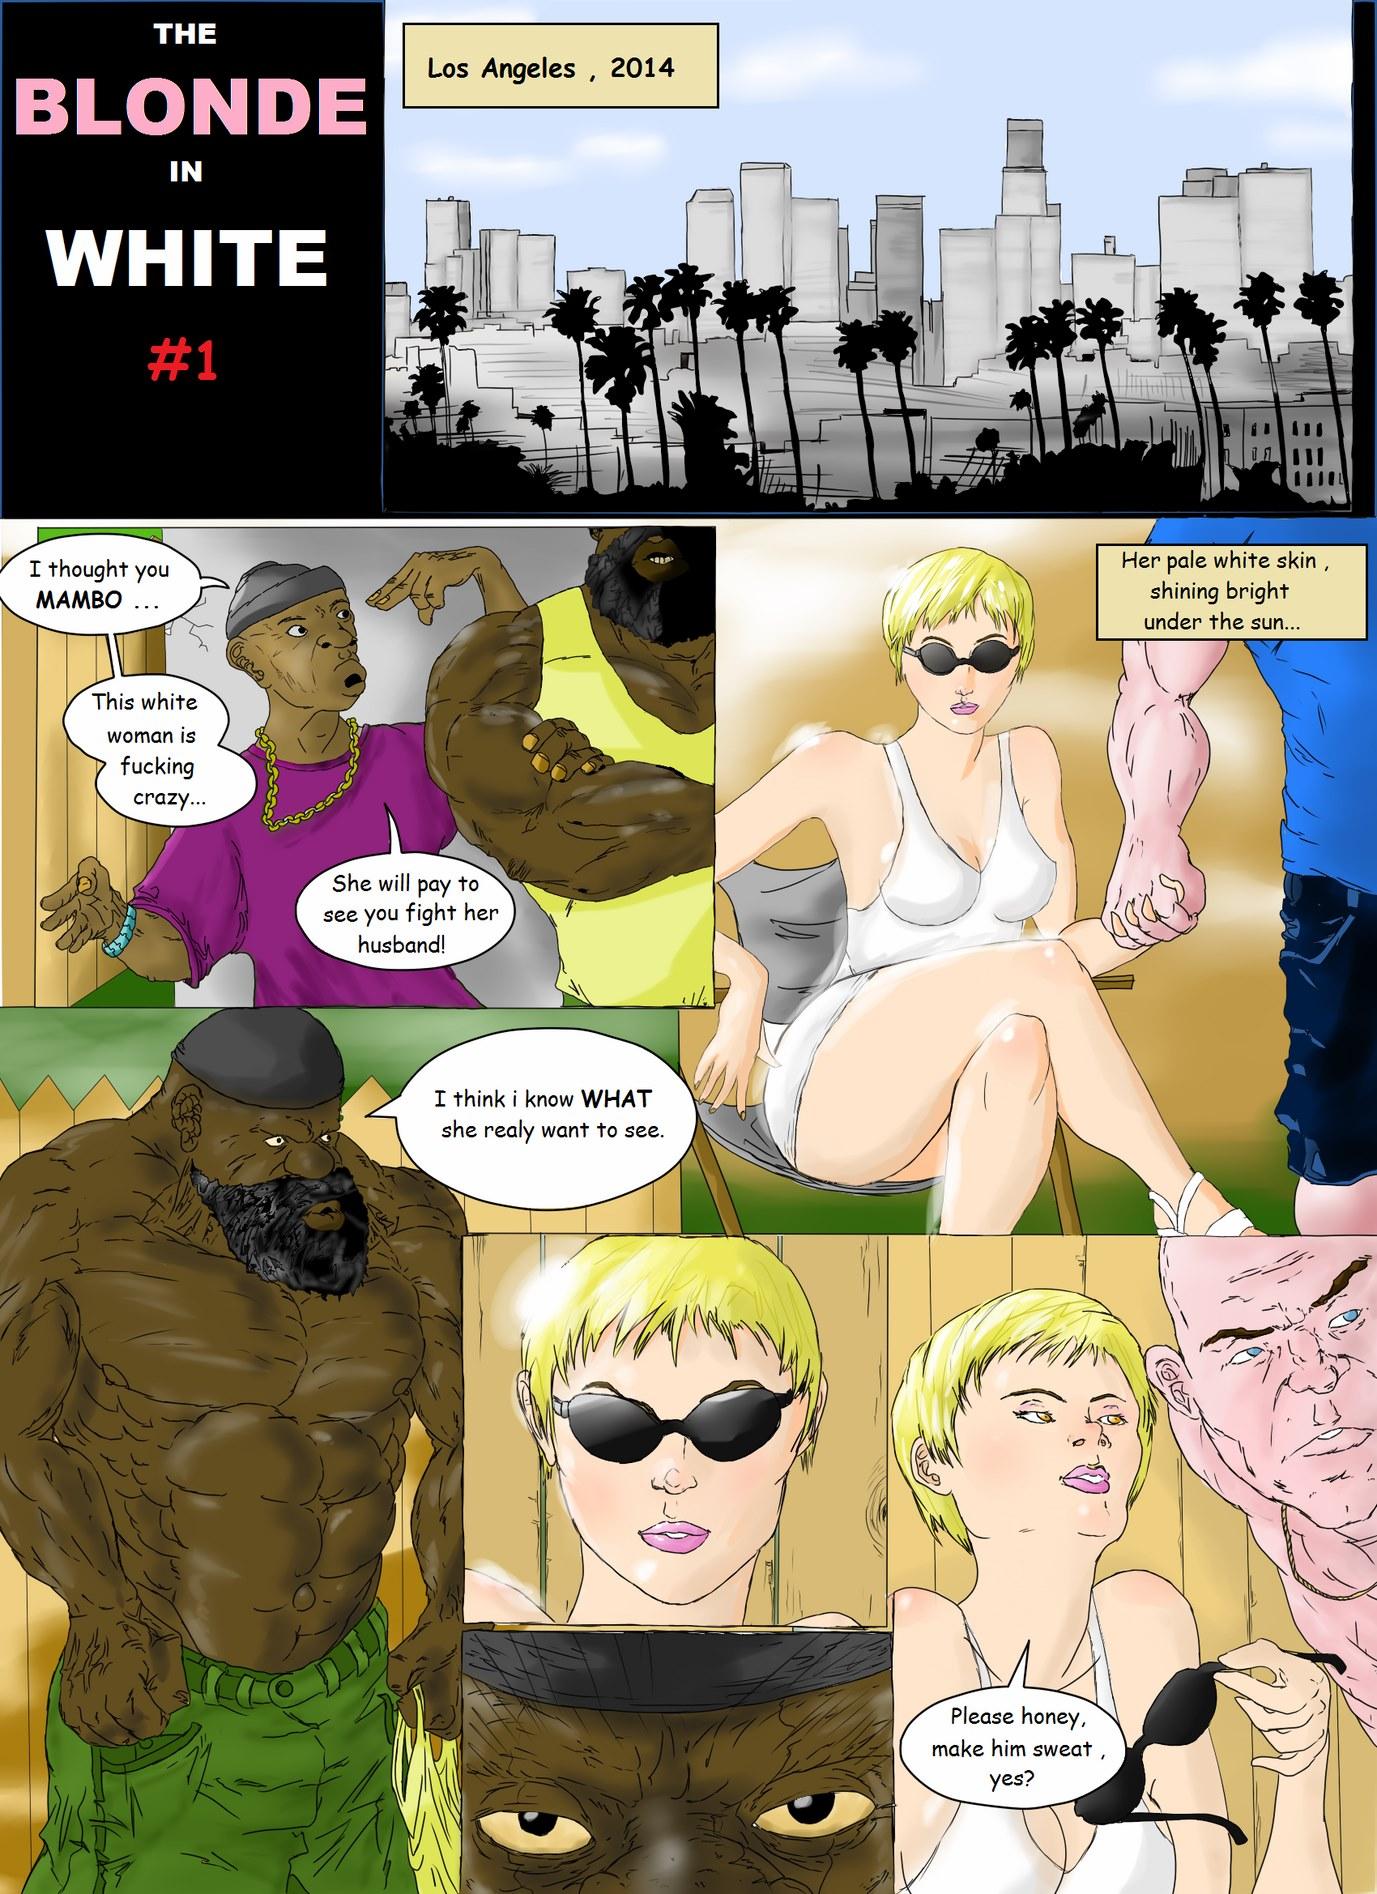 Porn Comics - Blonde in White # 1- Interracial porn comics 8 muses